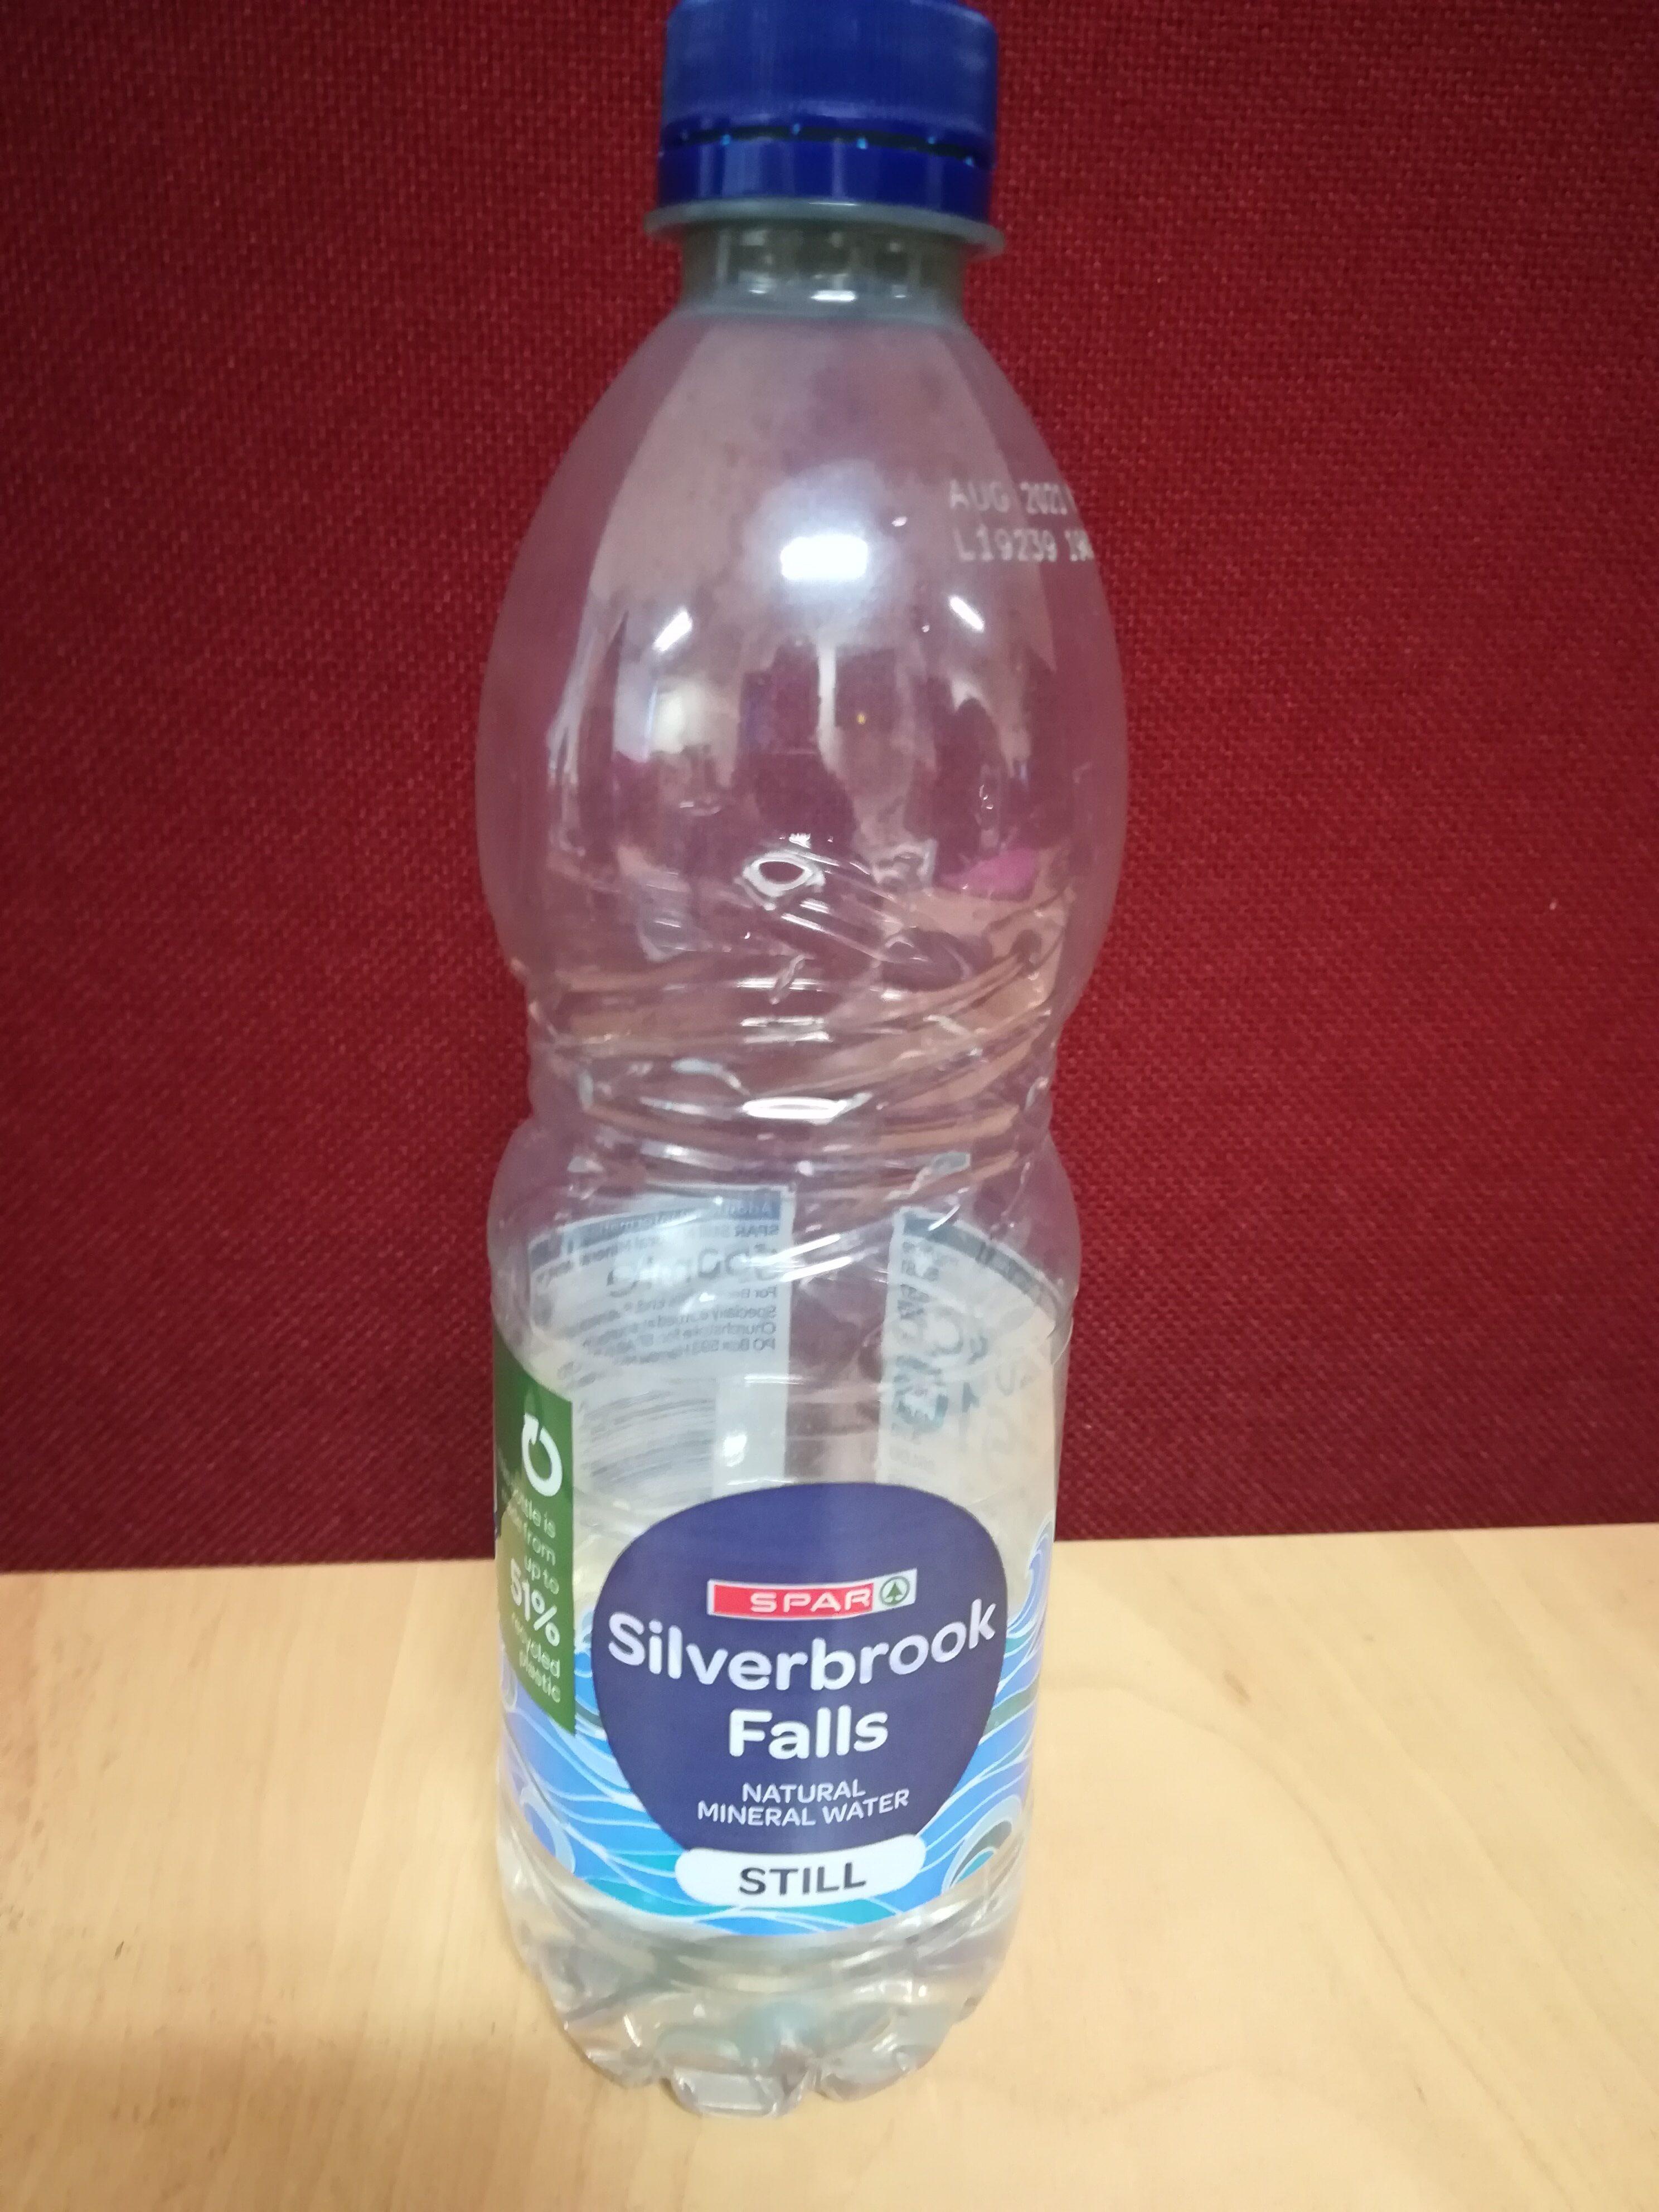 Silverbrook Falls Still Water - Product